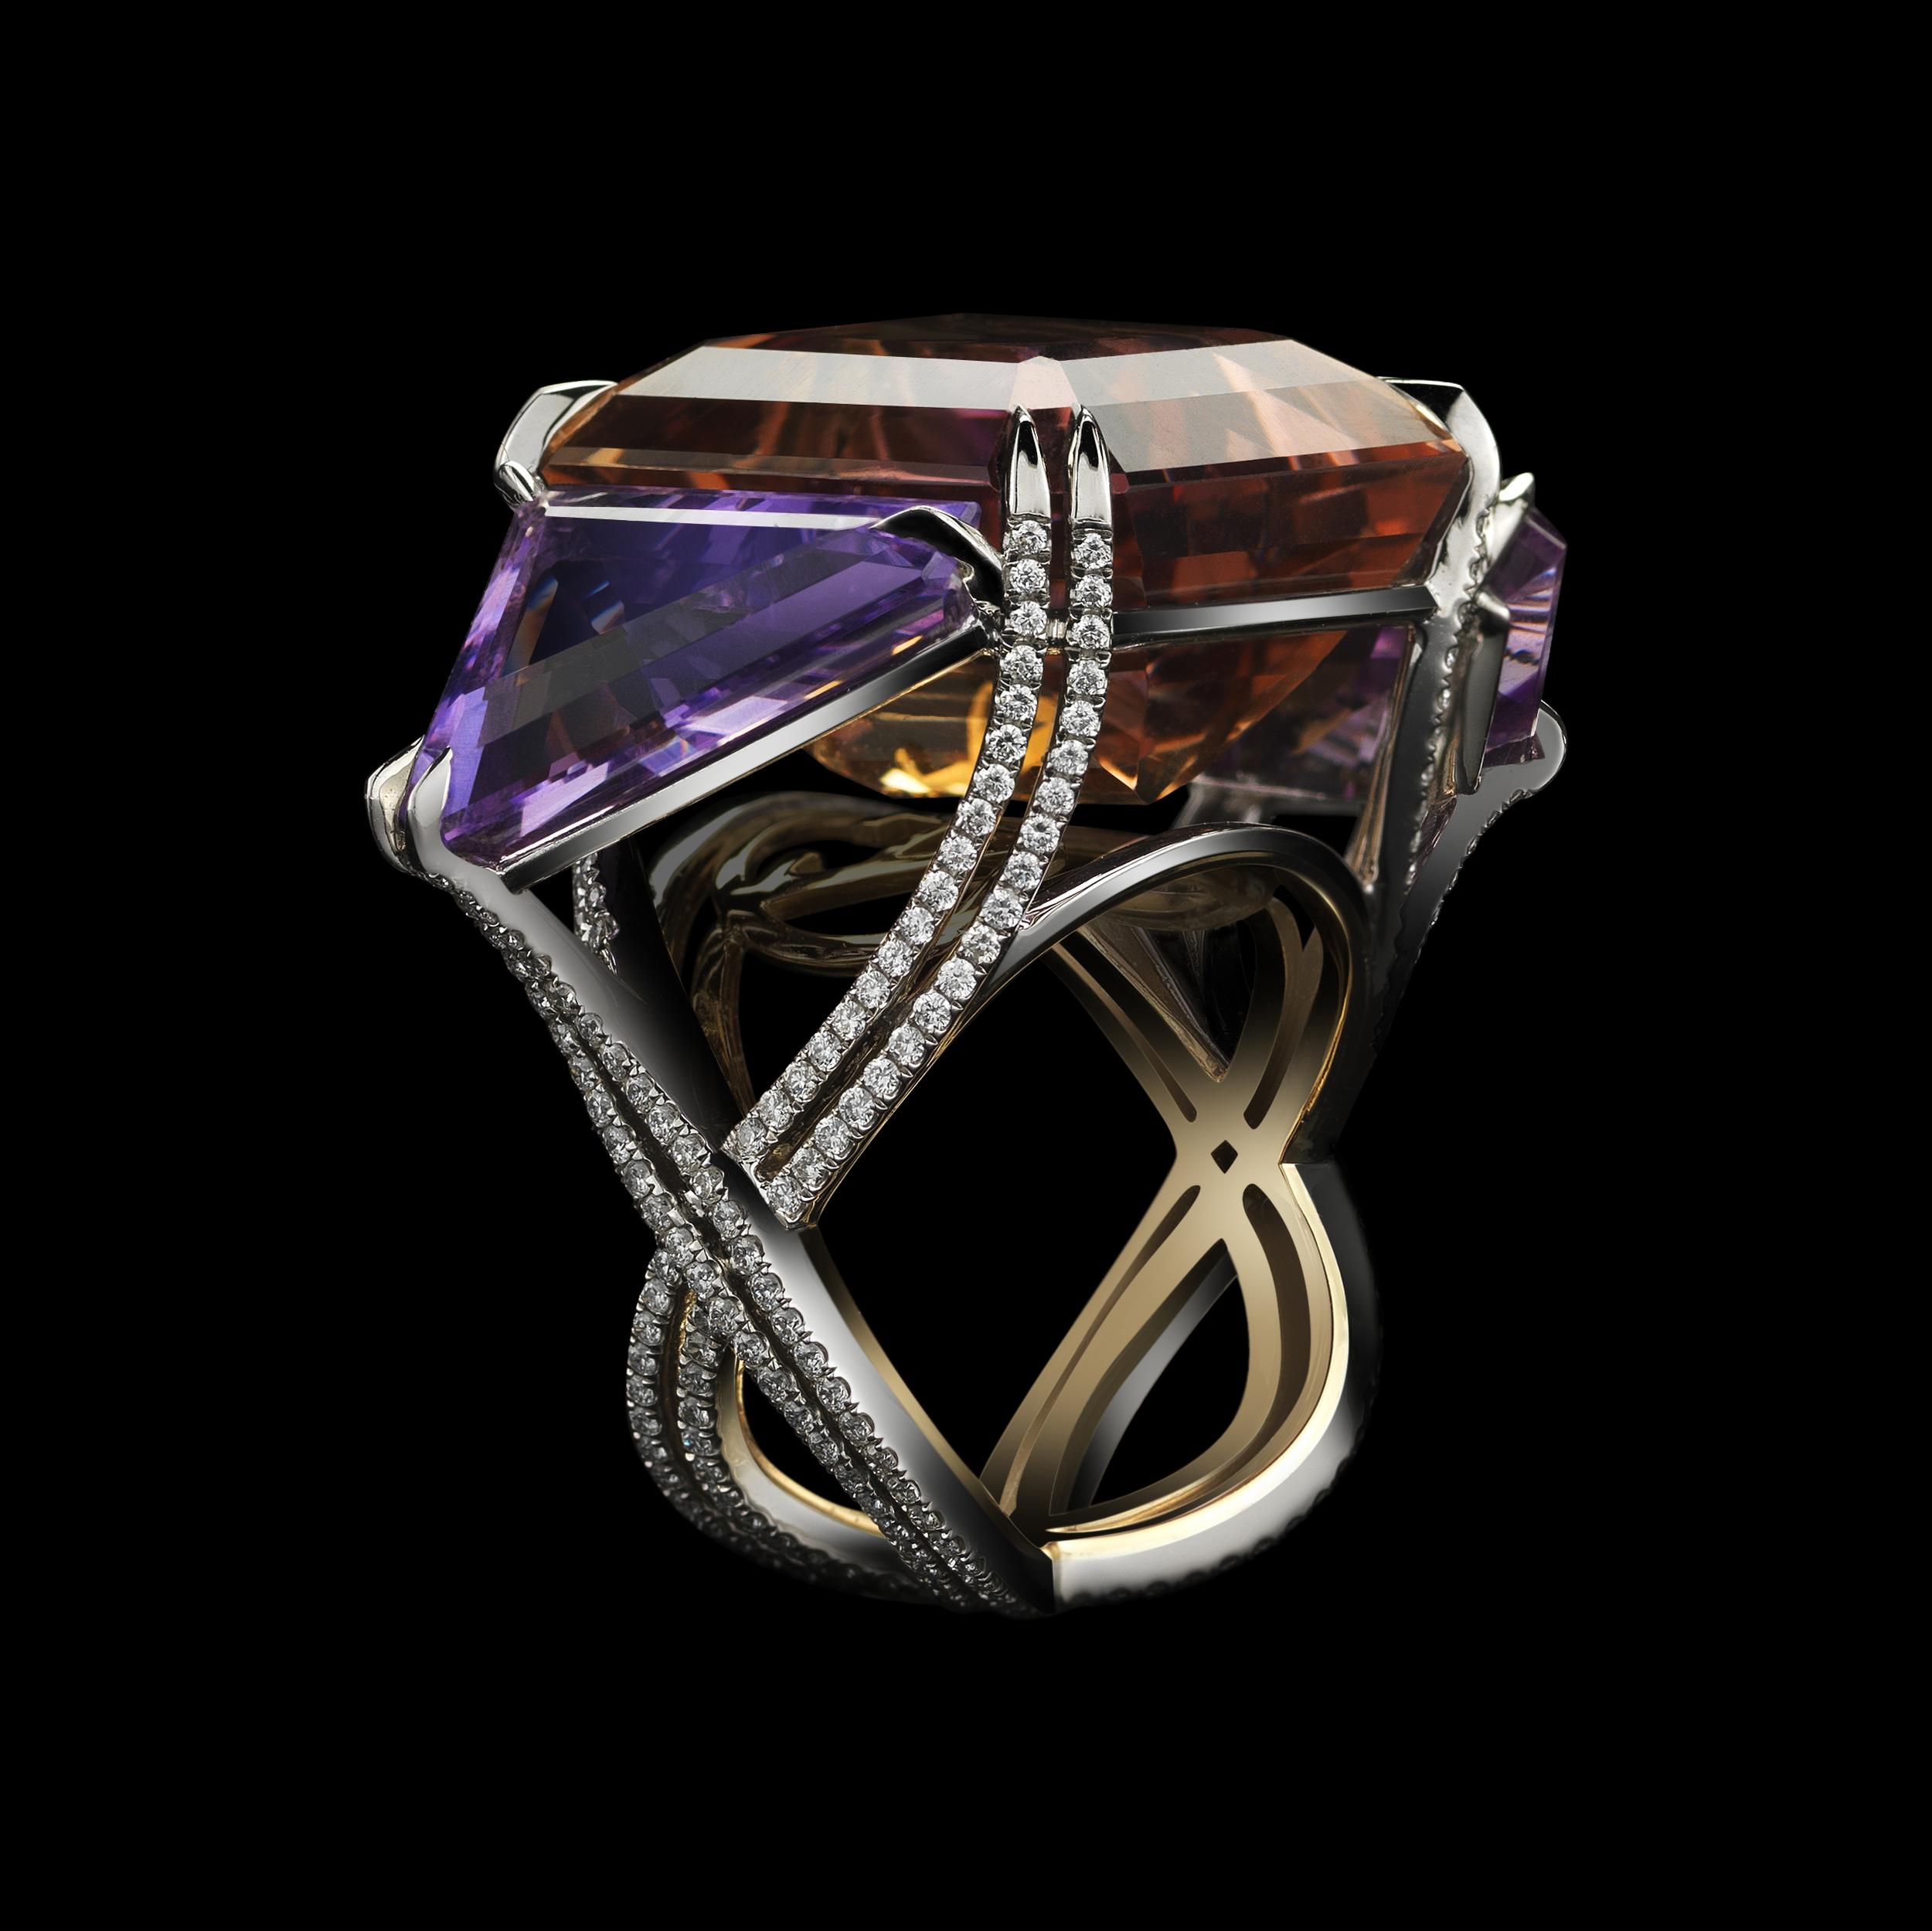 Asymmetrical Bicolor Ametrine & Diamond Three Stone Ring AMRG4009-01_B HI RES BLK BG.jpeg